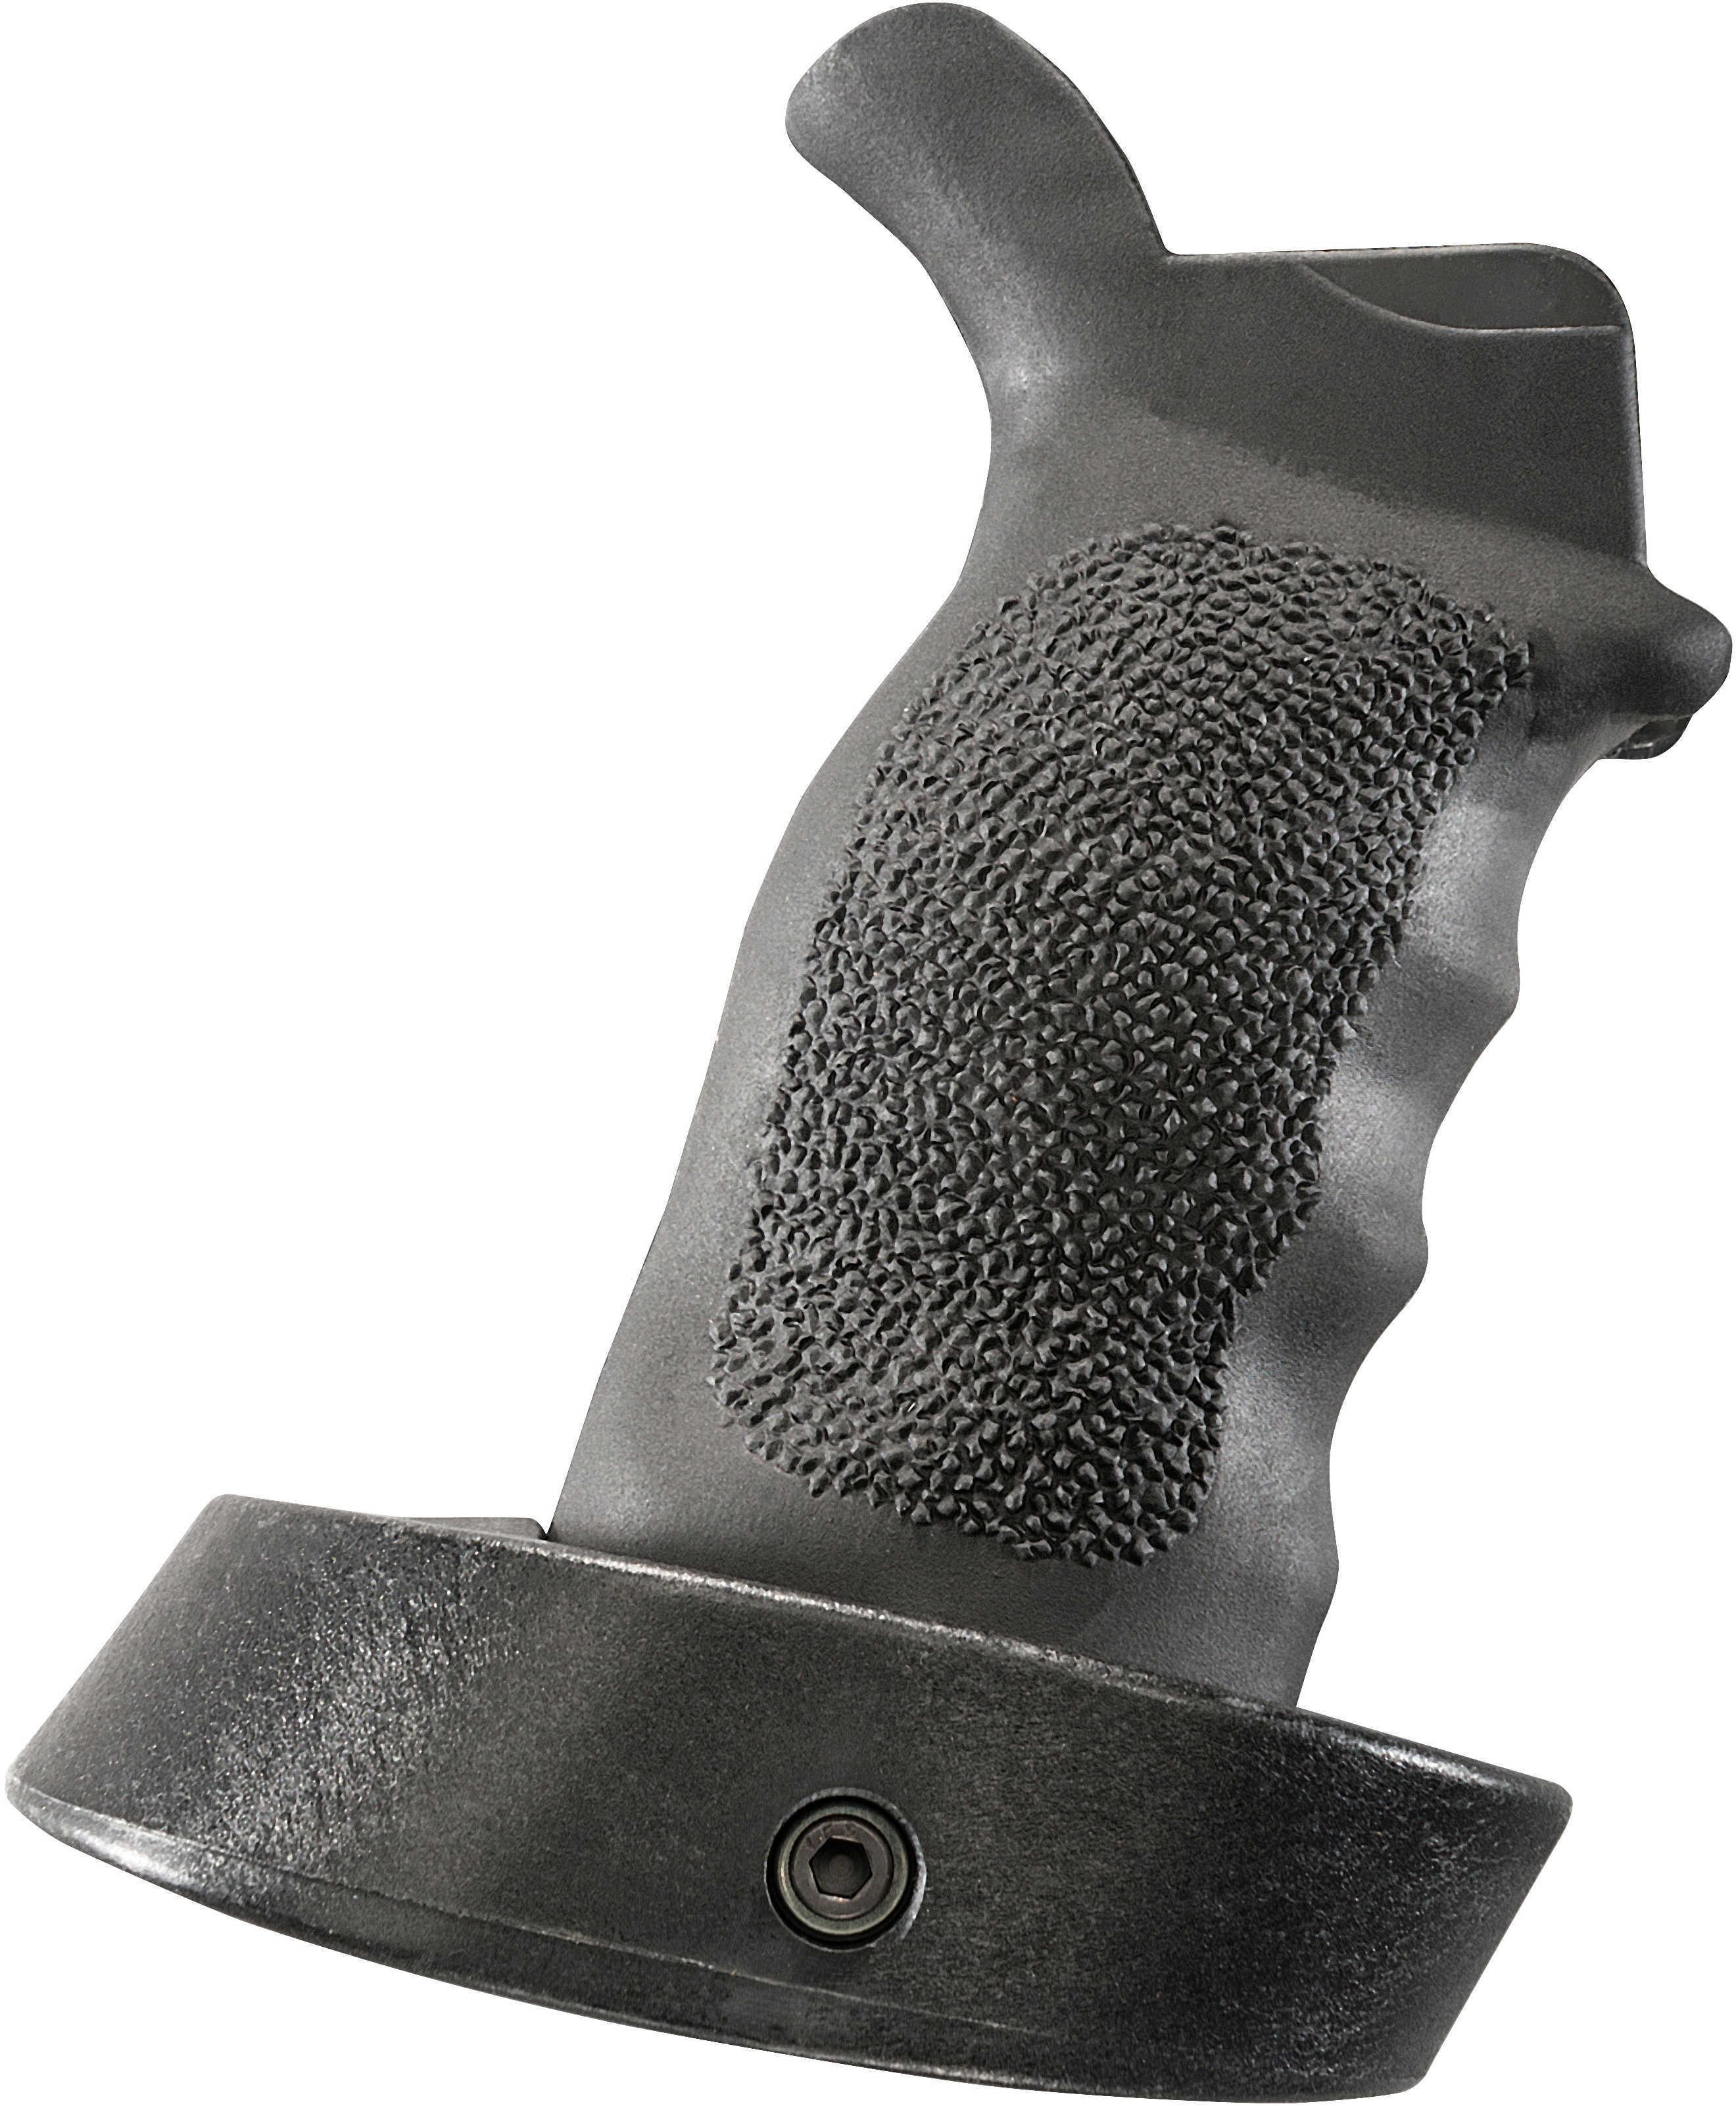 Ergo AR15/M16 Tactical Deluxe Grip w/Palm Shelf Standard Frame, Black 4055-BK